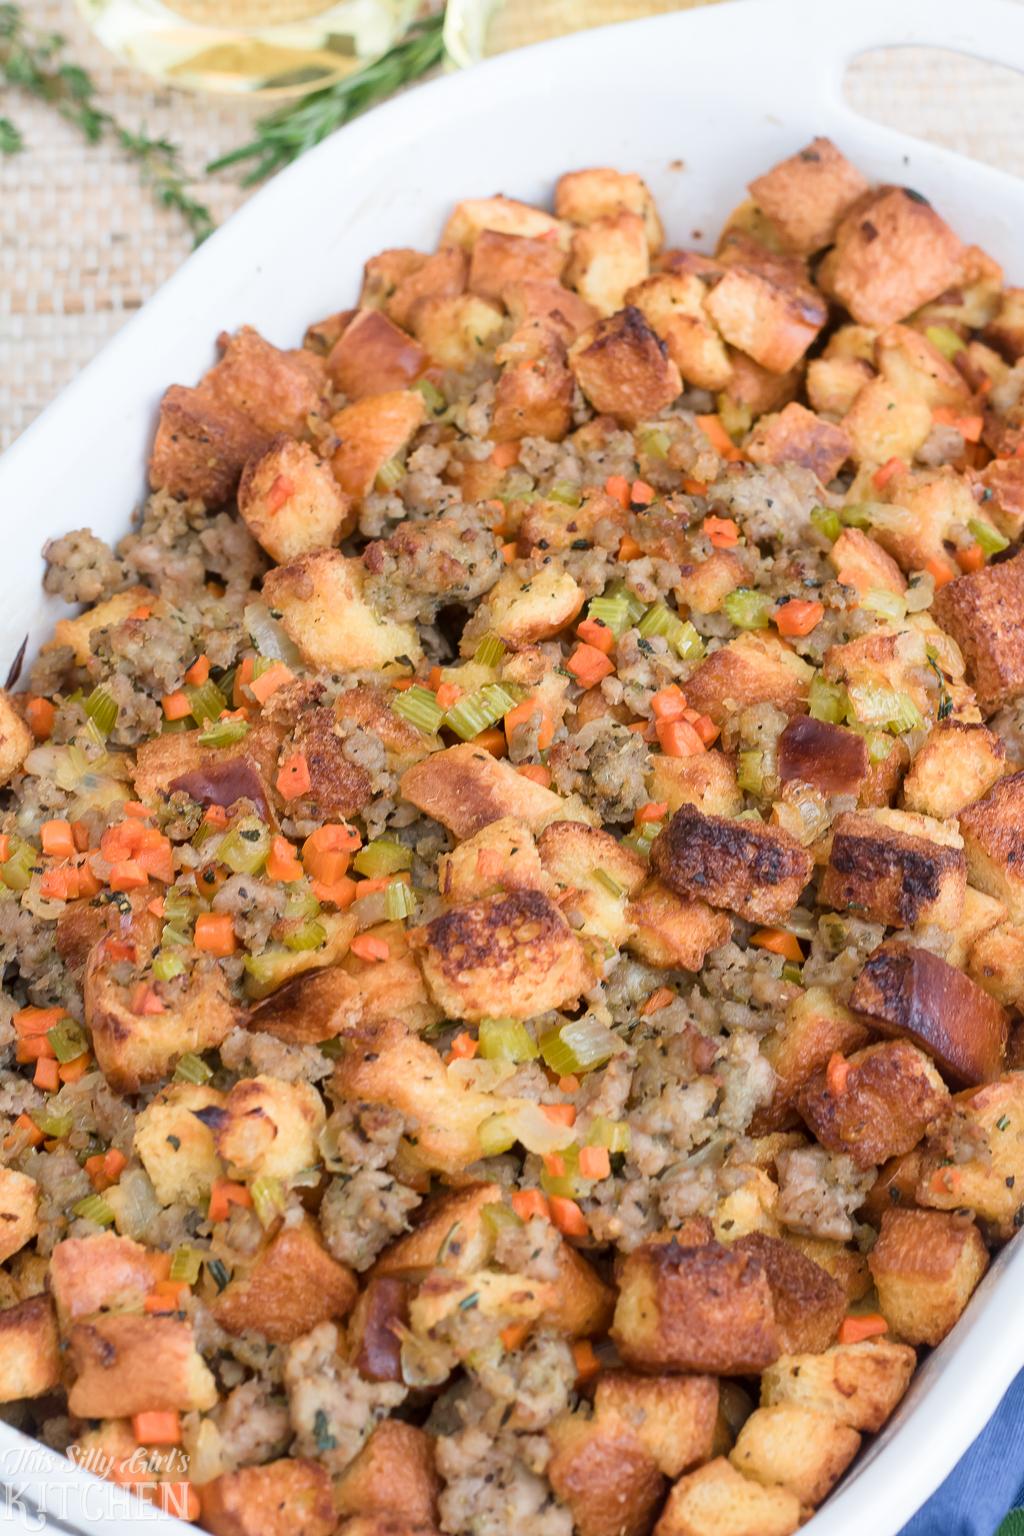 Italian Sausage Stuffing in casserole dish